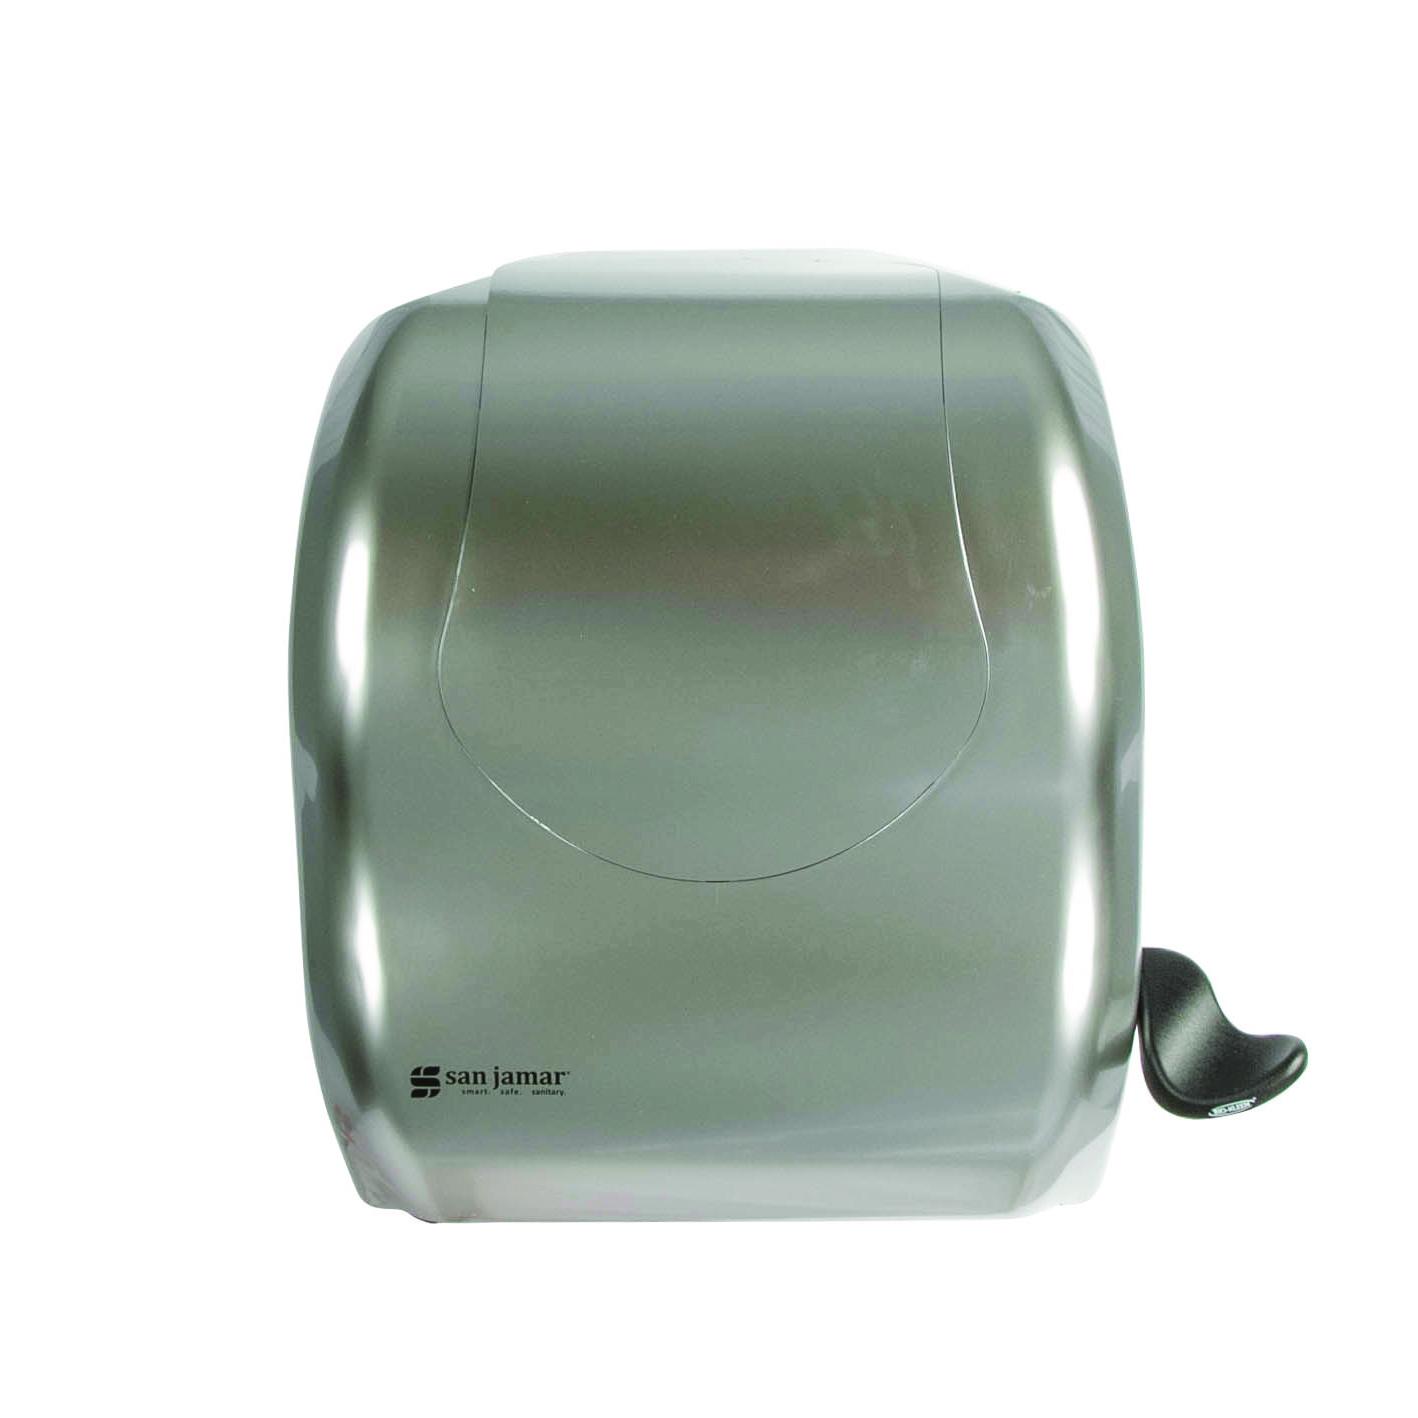 San Jamar T970SS paper towel dispenser